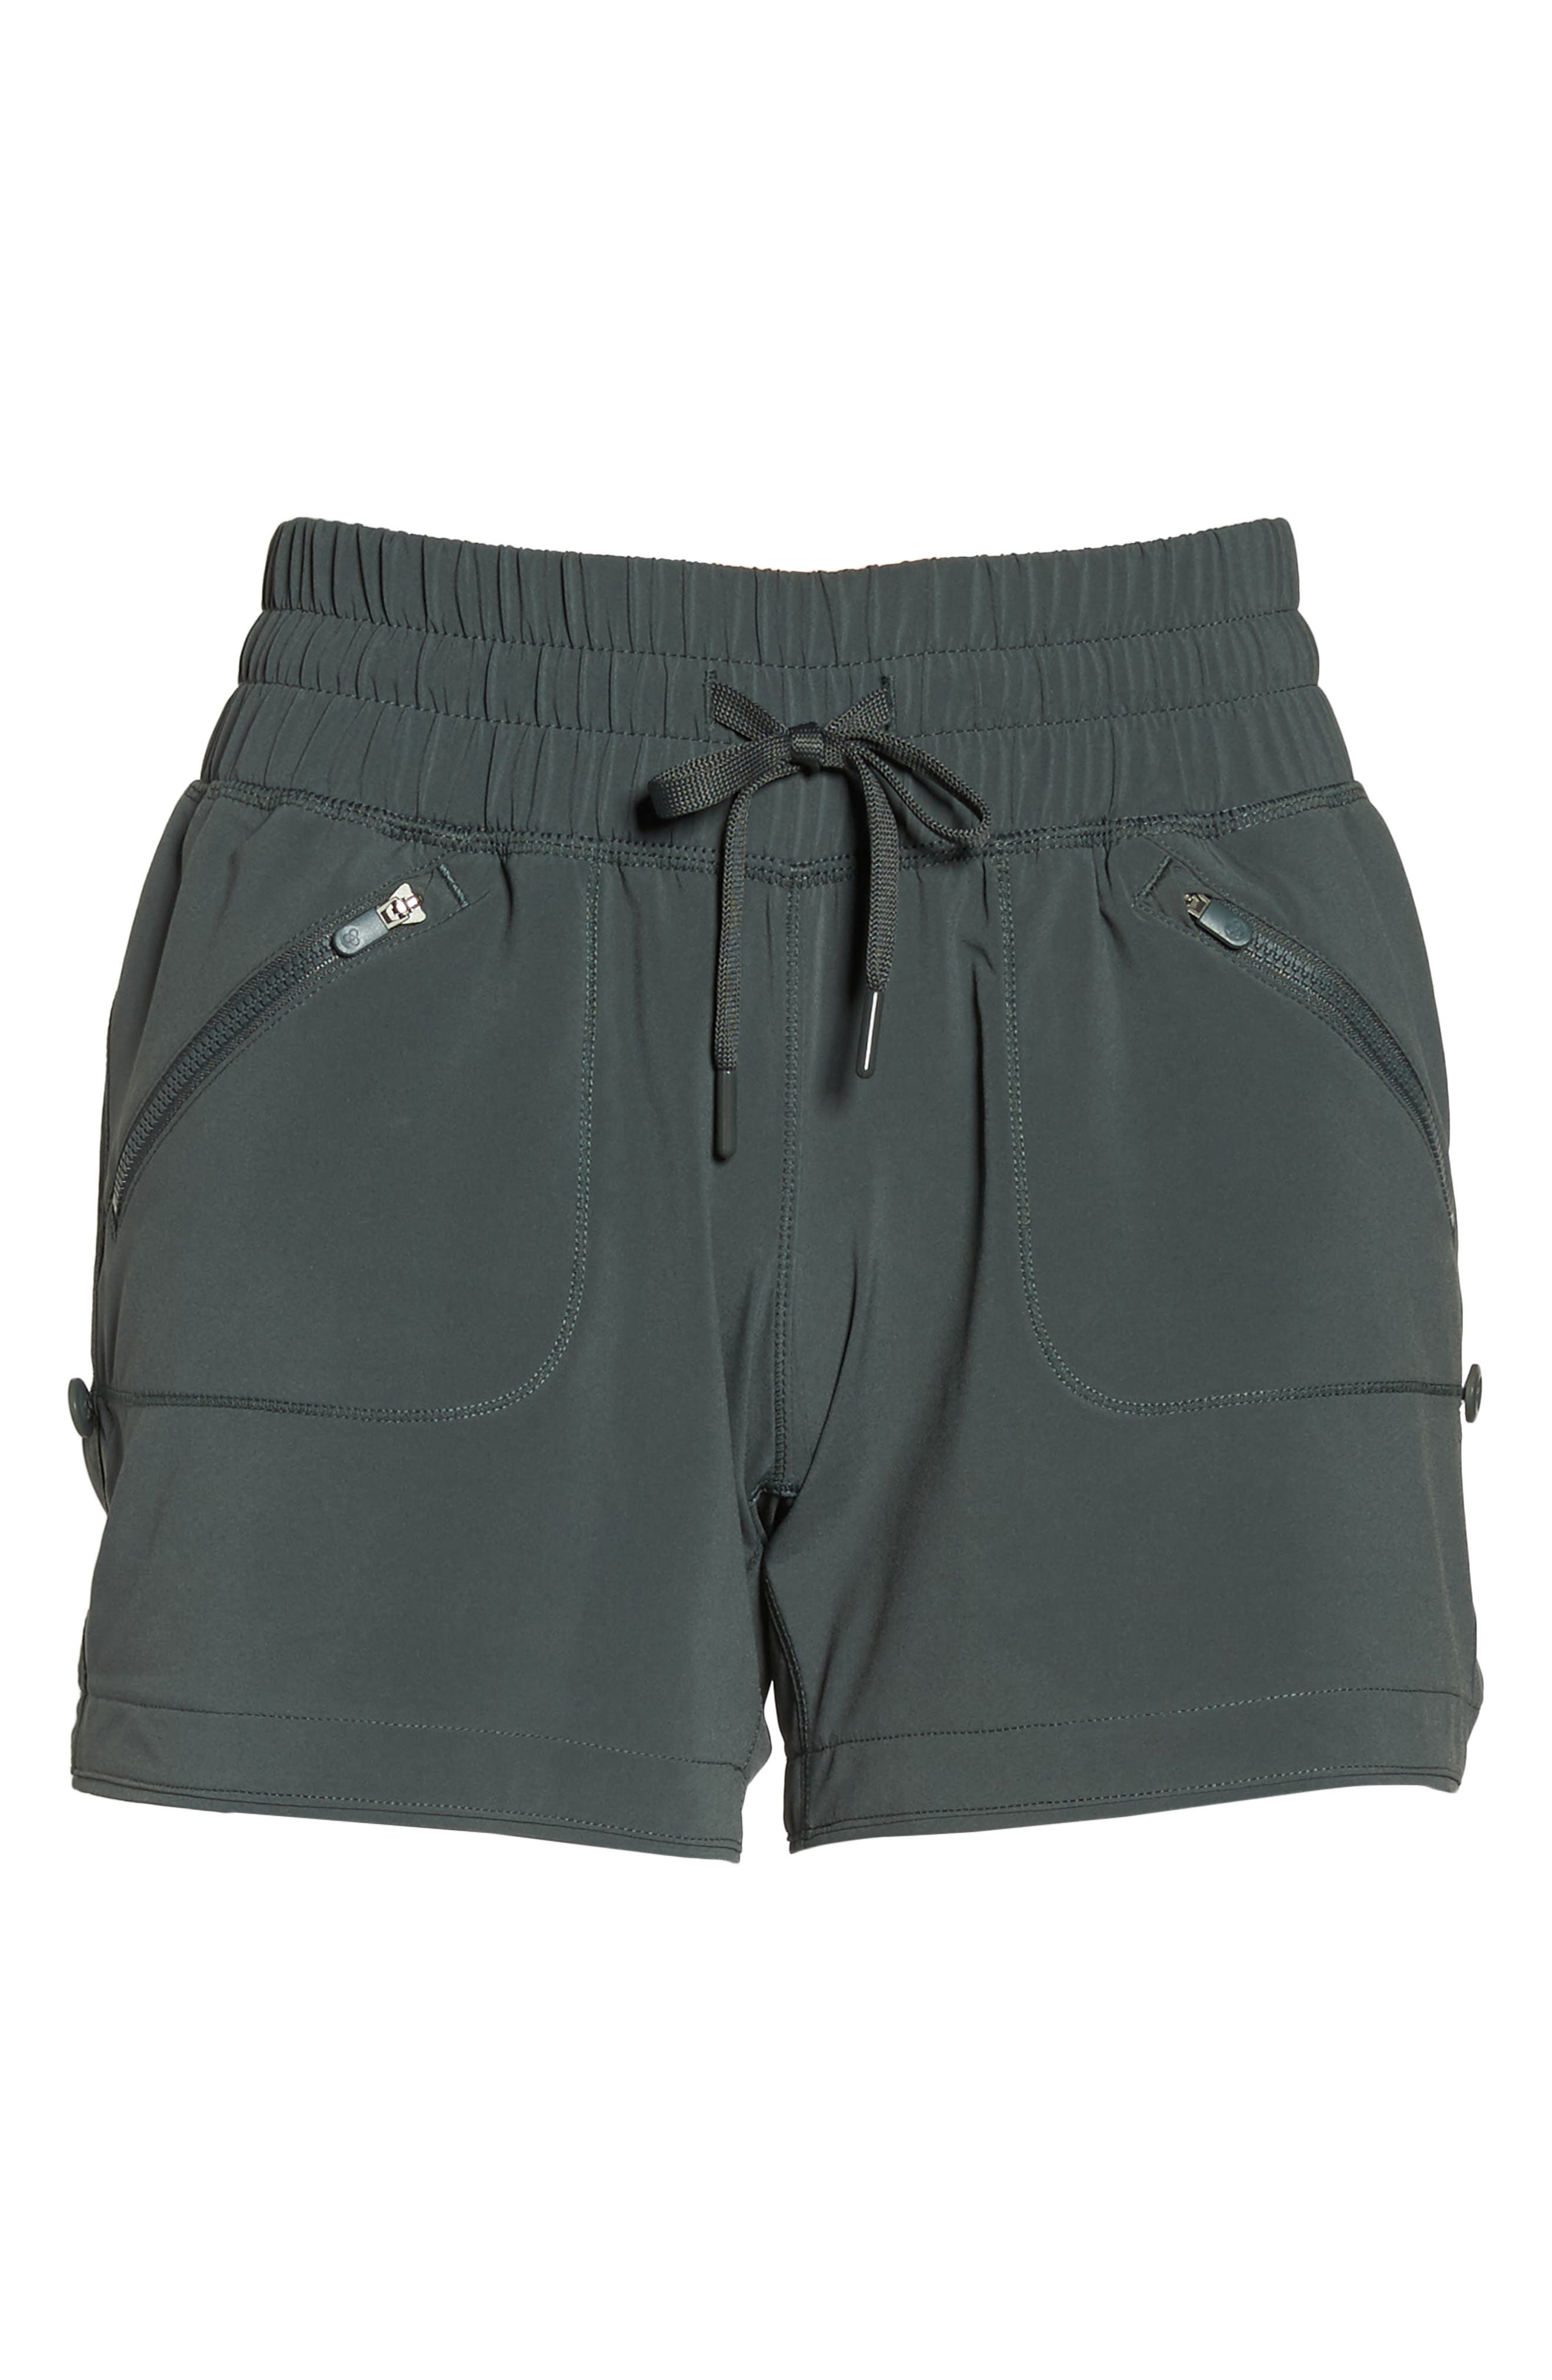 Switchback Shorts,                             Alternate thumbnail 51, color,